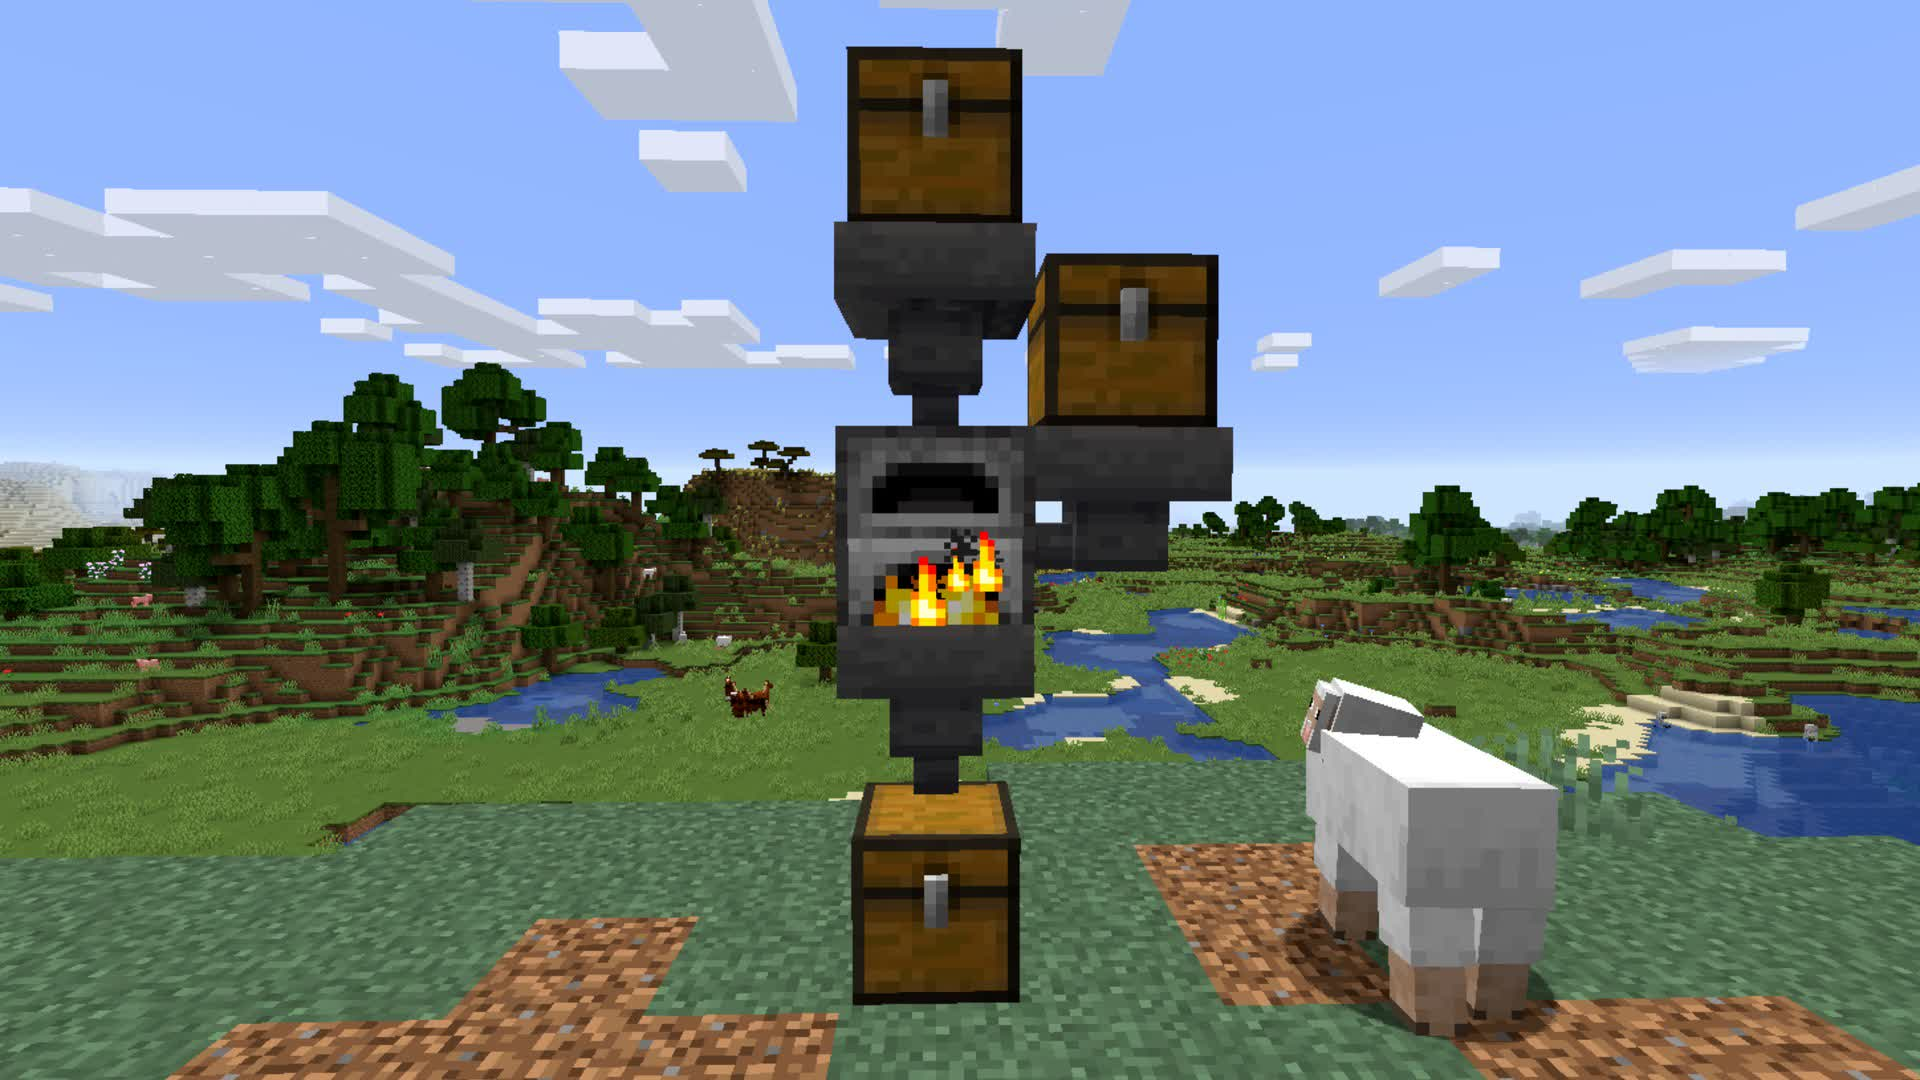 A simple smelting setup in vanilla Minecraft